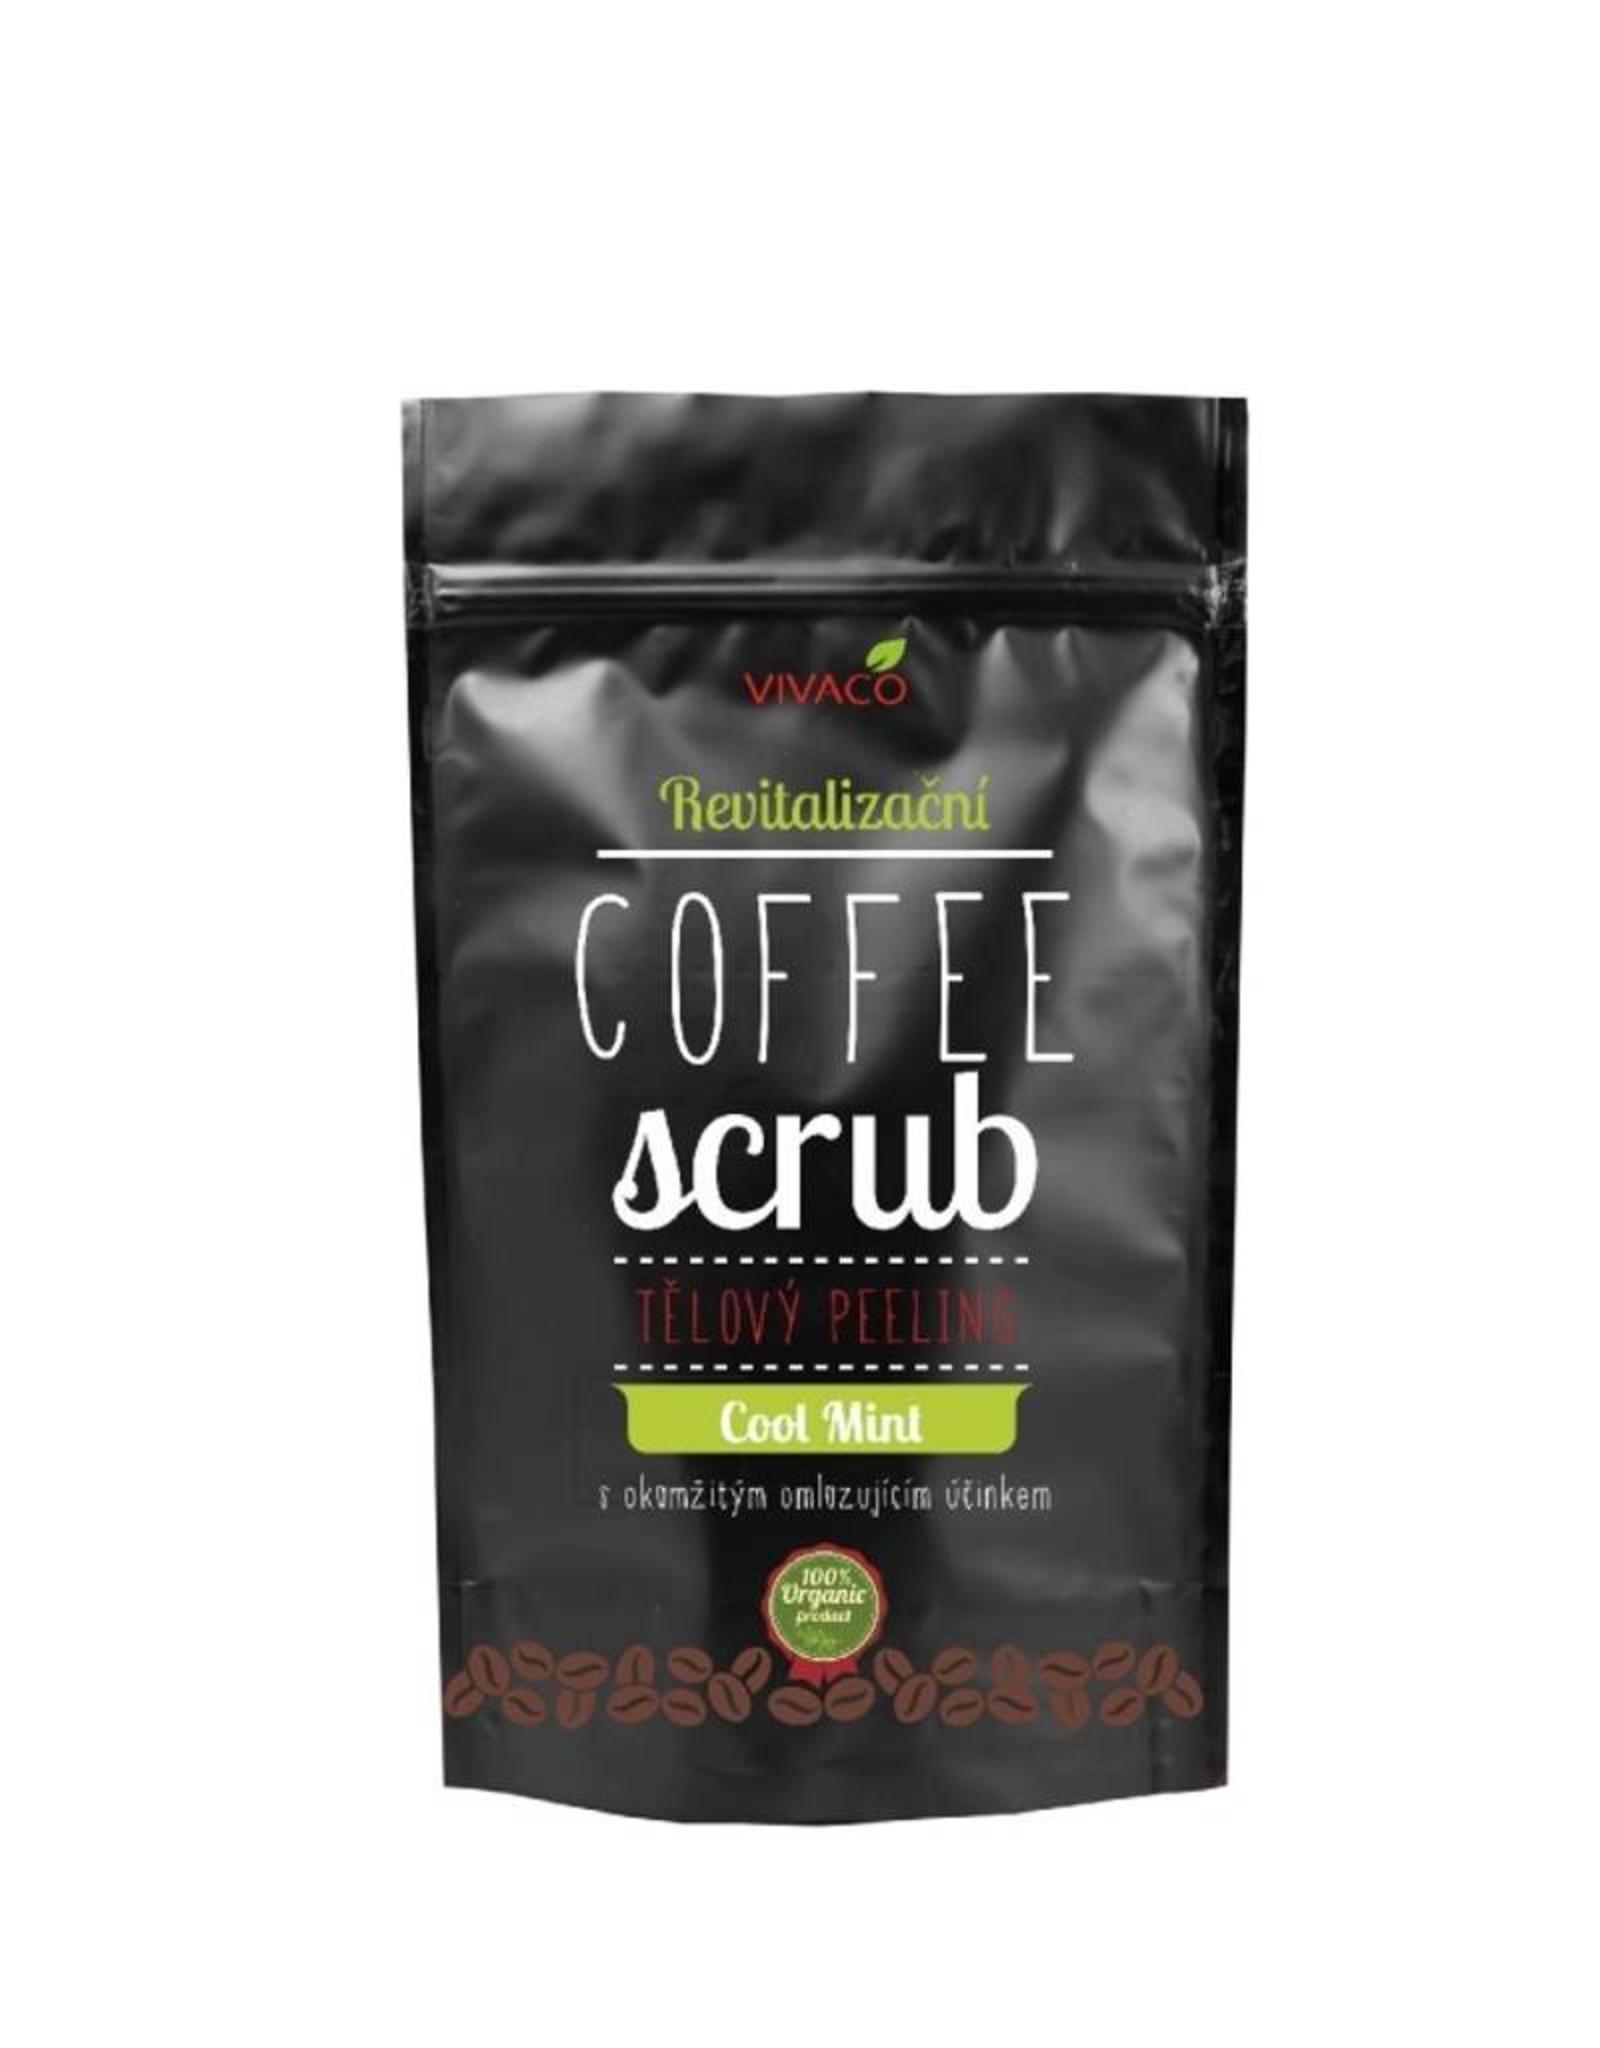 VIVACO Coffee Scrub Body Peeling Cool Mint (100% organisch)